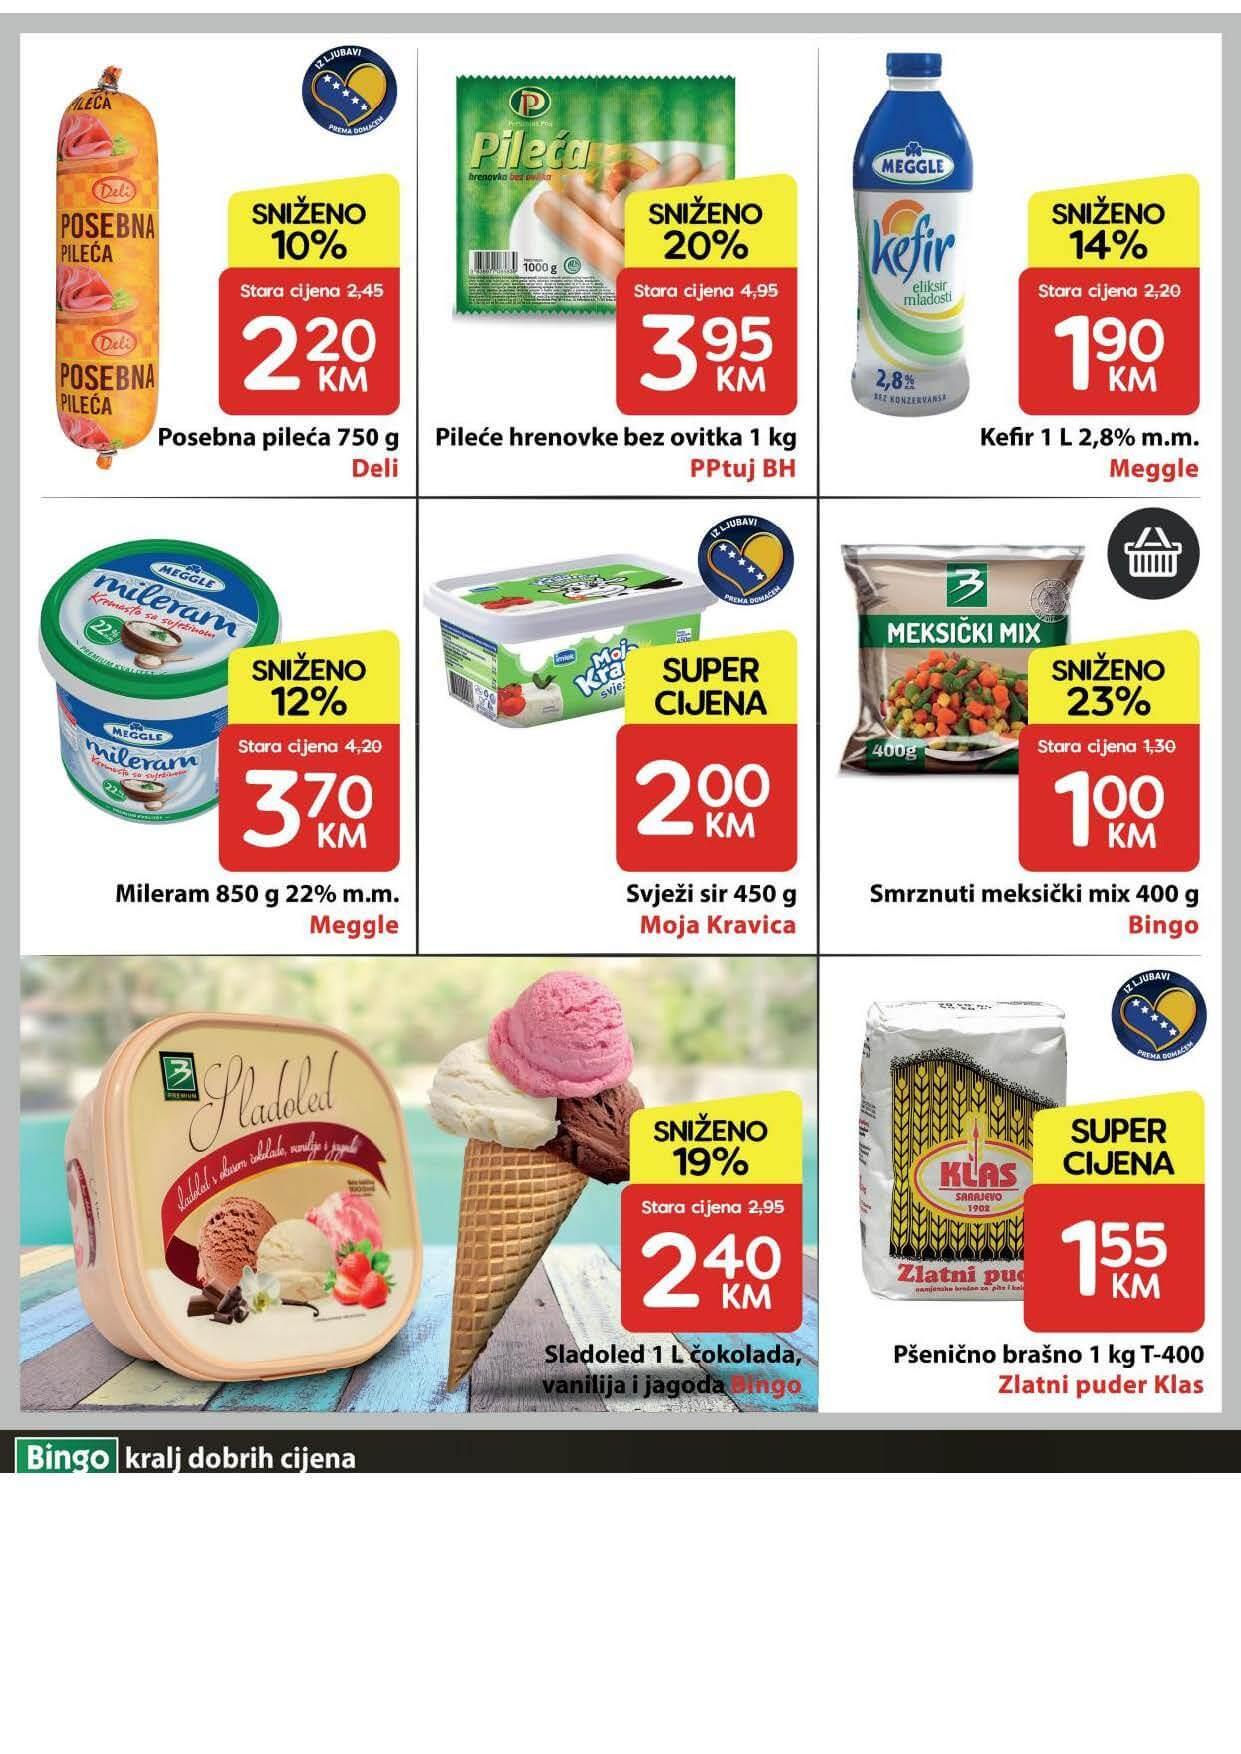 BINGO Katalog U Bingu vikend akcija traje cetiri dana JUN 2021 17.6. 20.6. eKatalozi.com PR Page 2